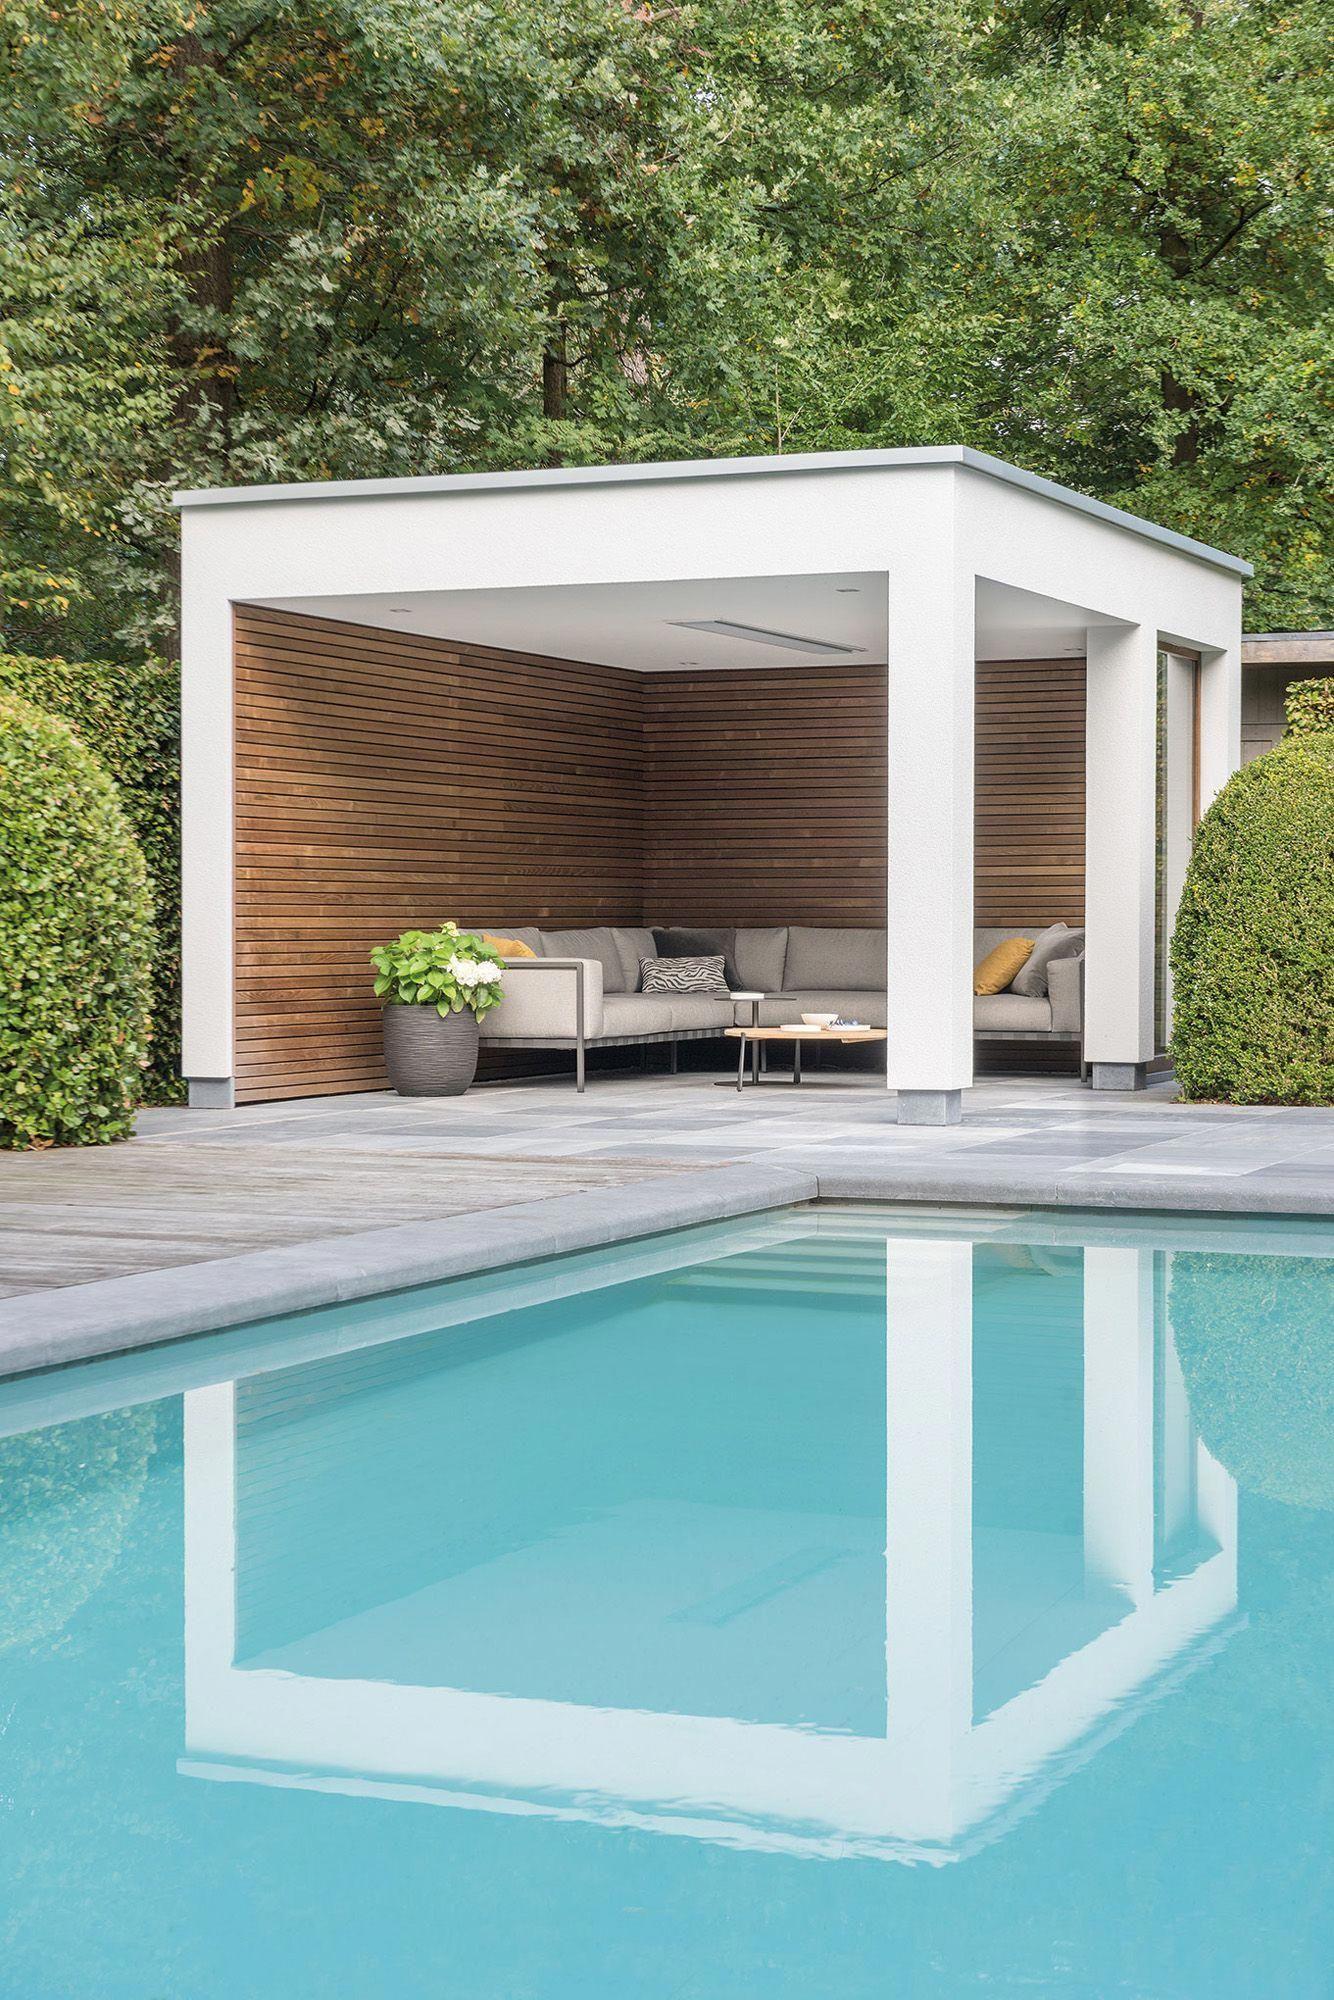 Moderne Poolhouse In Hout Livinlodge By Carpentier Poollandscapingideas Outdoor Remodel Pool Gazebo Simple Pool